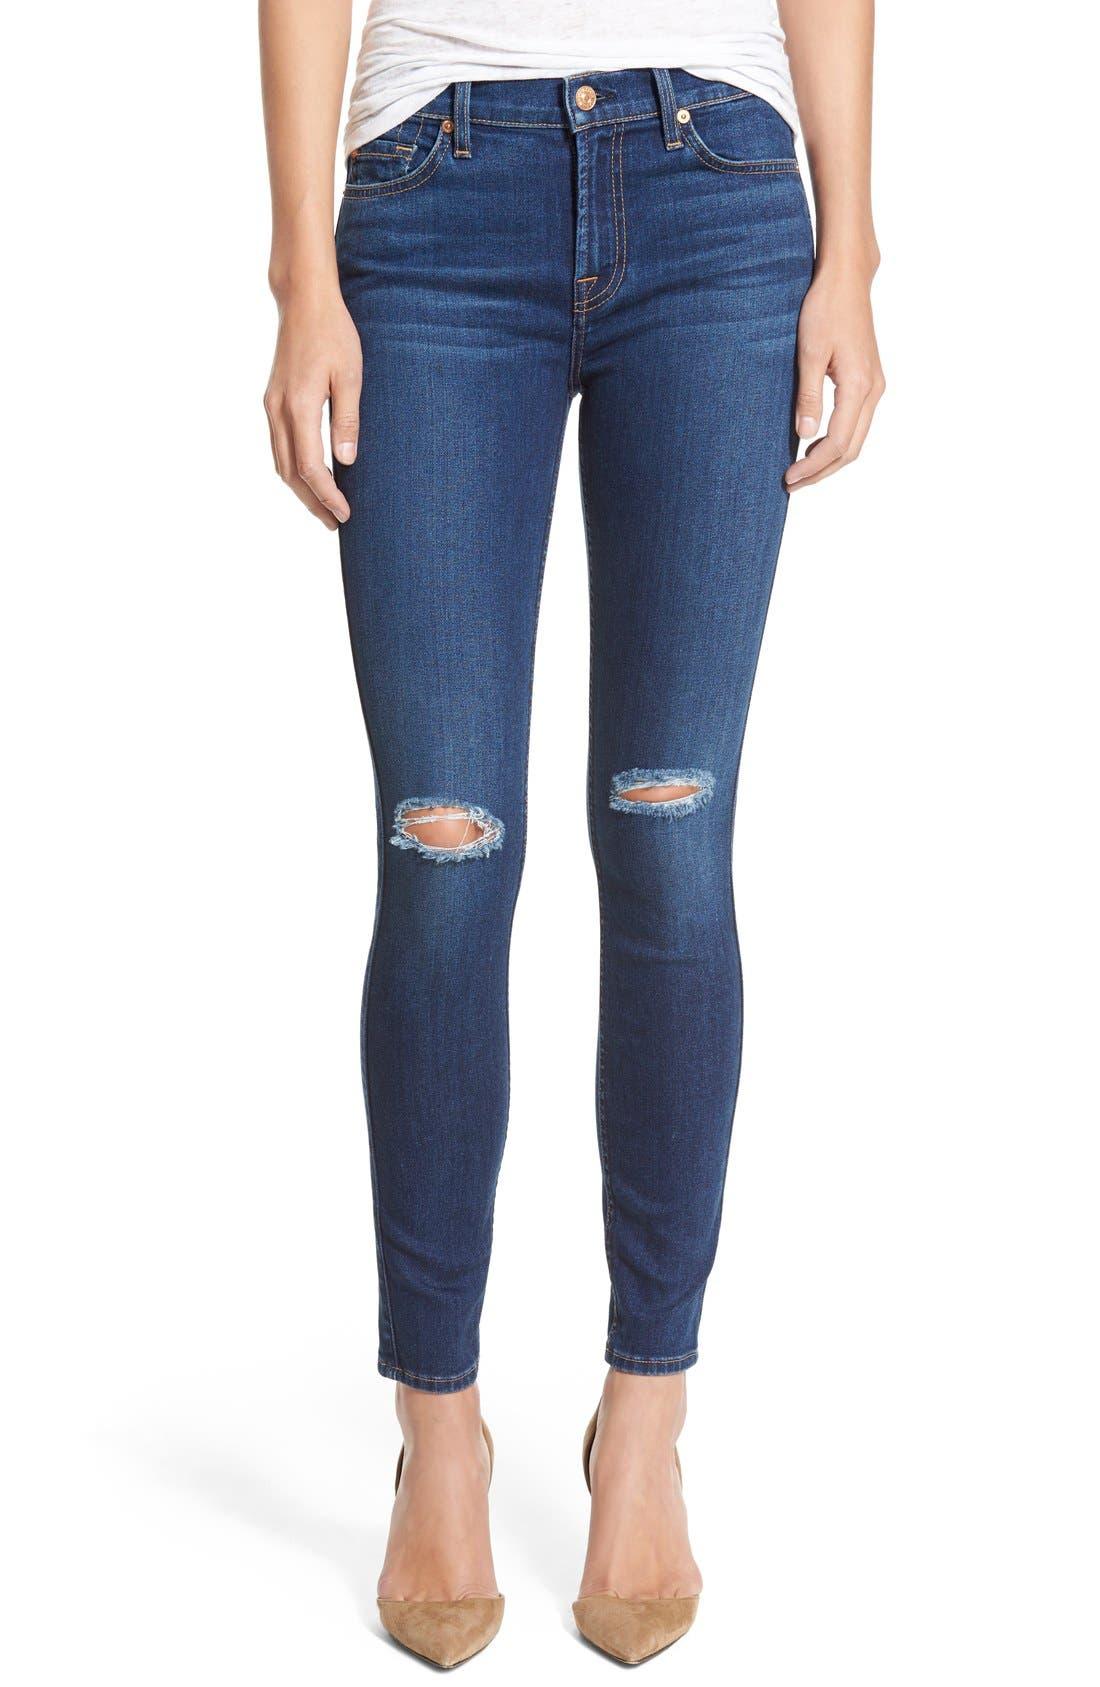 Alternate Image 1 Selected - 7 For All Mankind® Destroyed Ankle Skinny Jeans (Stunning Seville 2)